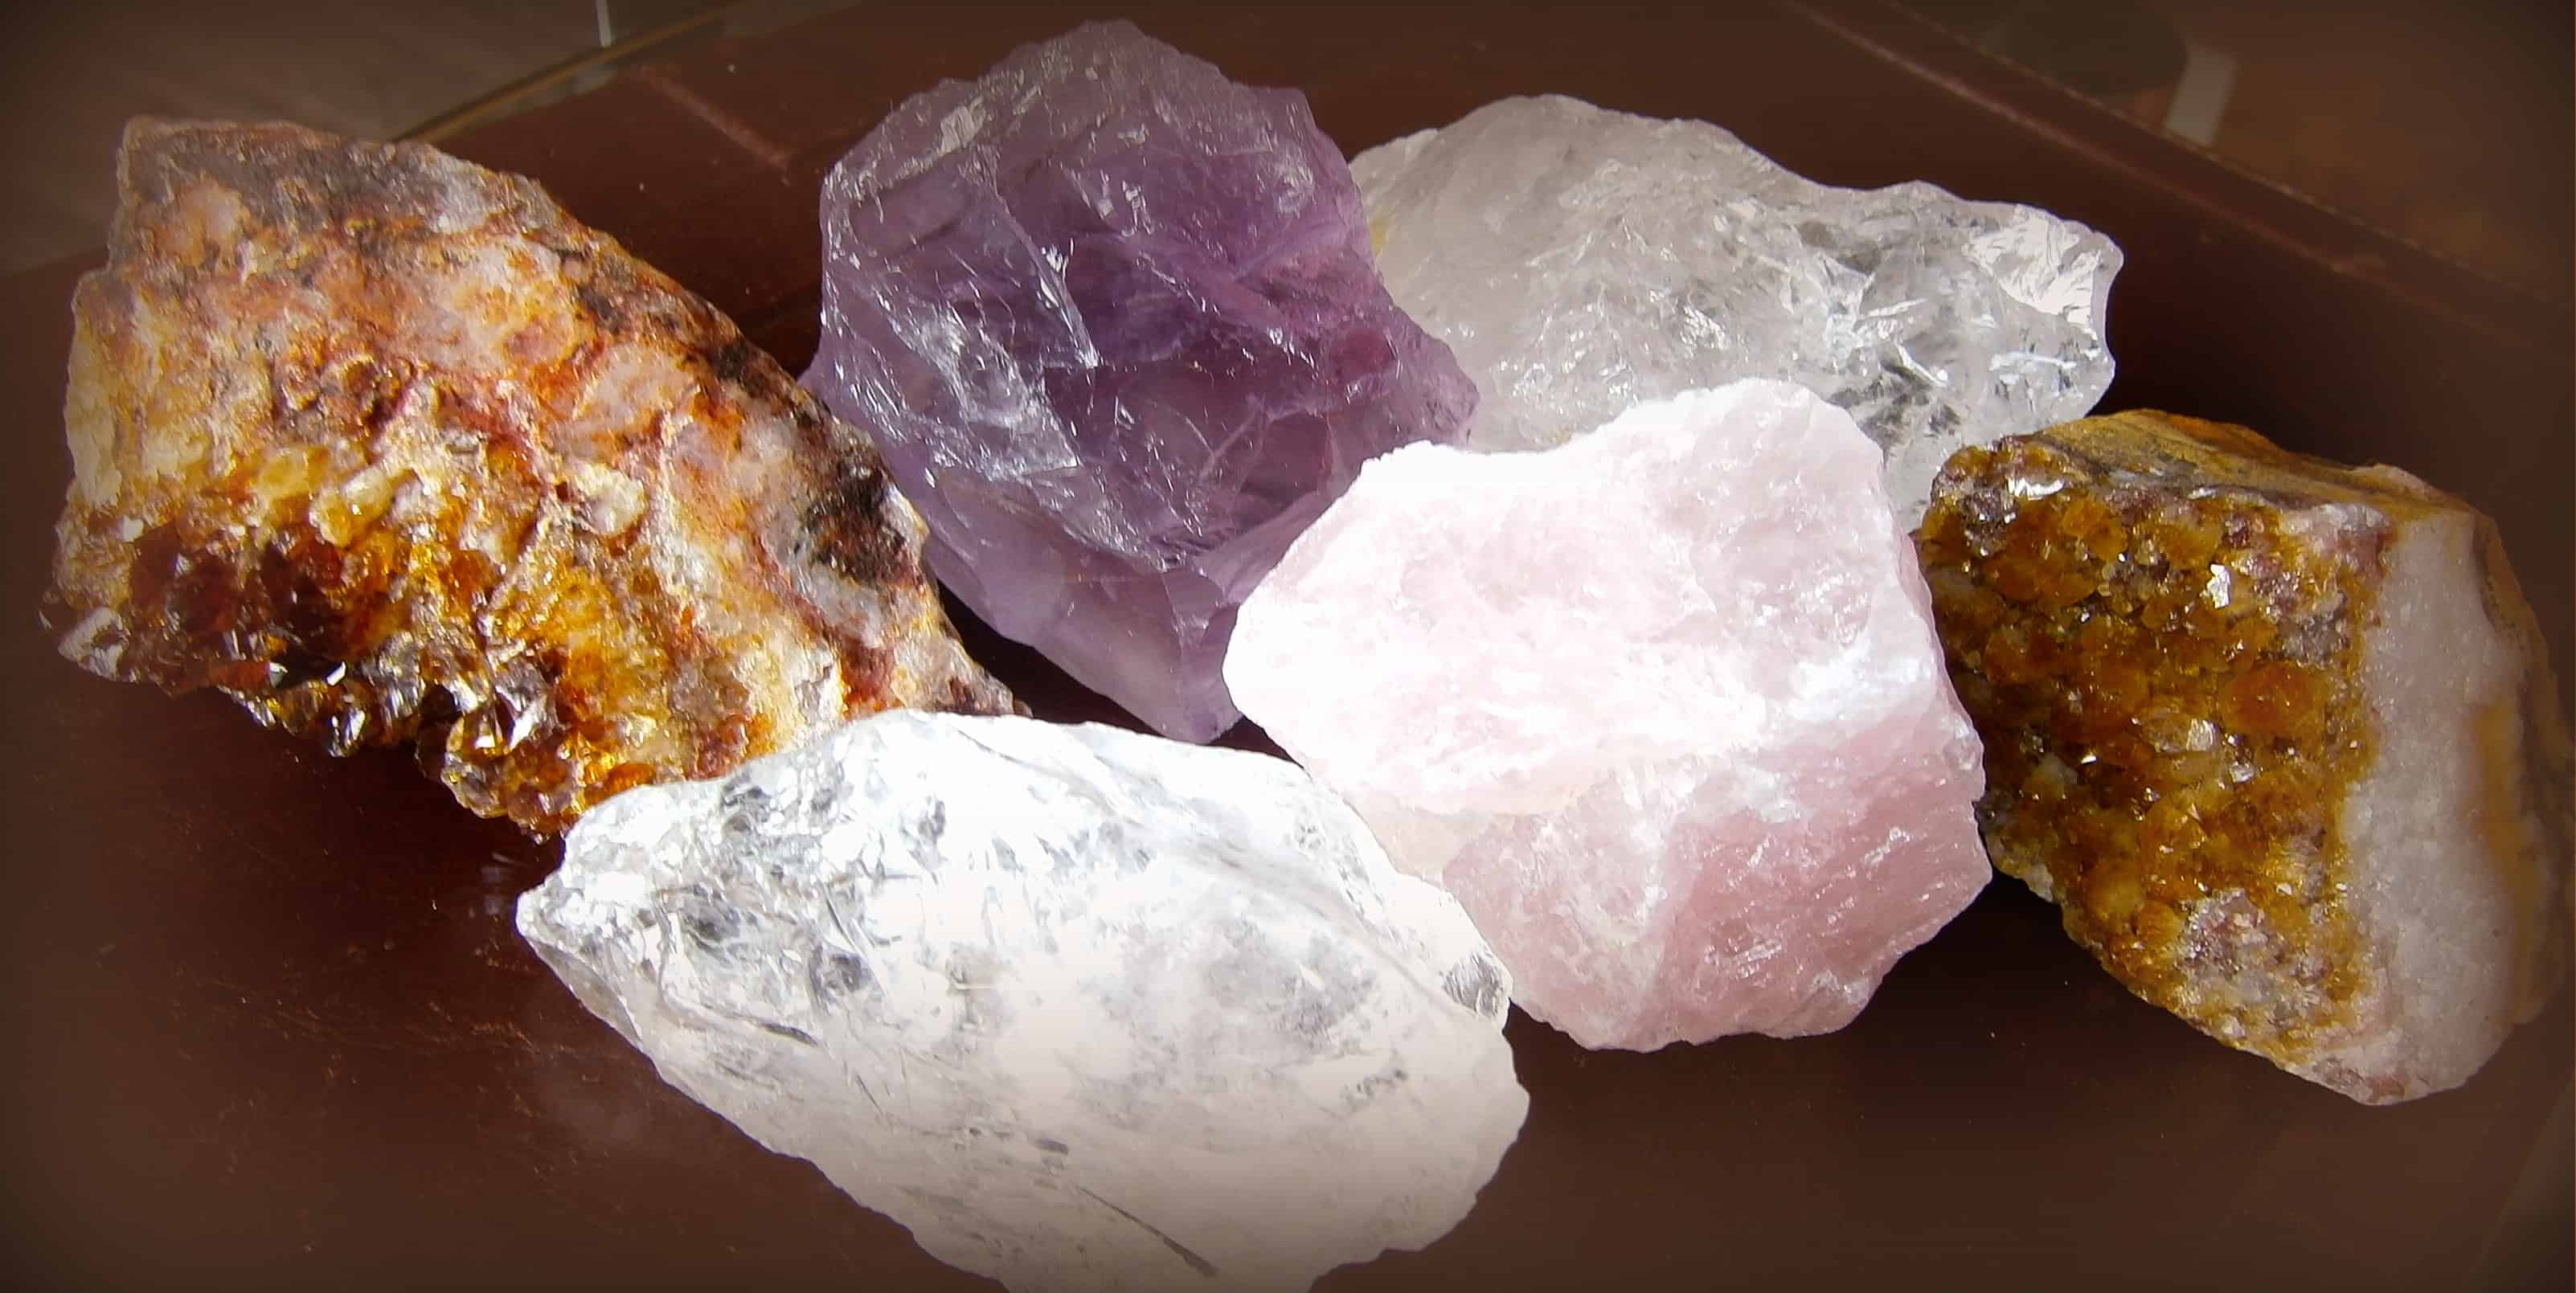 Kristali i drago kamenje za uravnoteženje energije